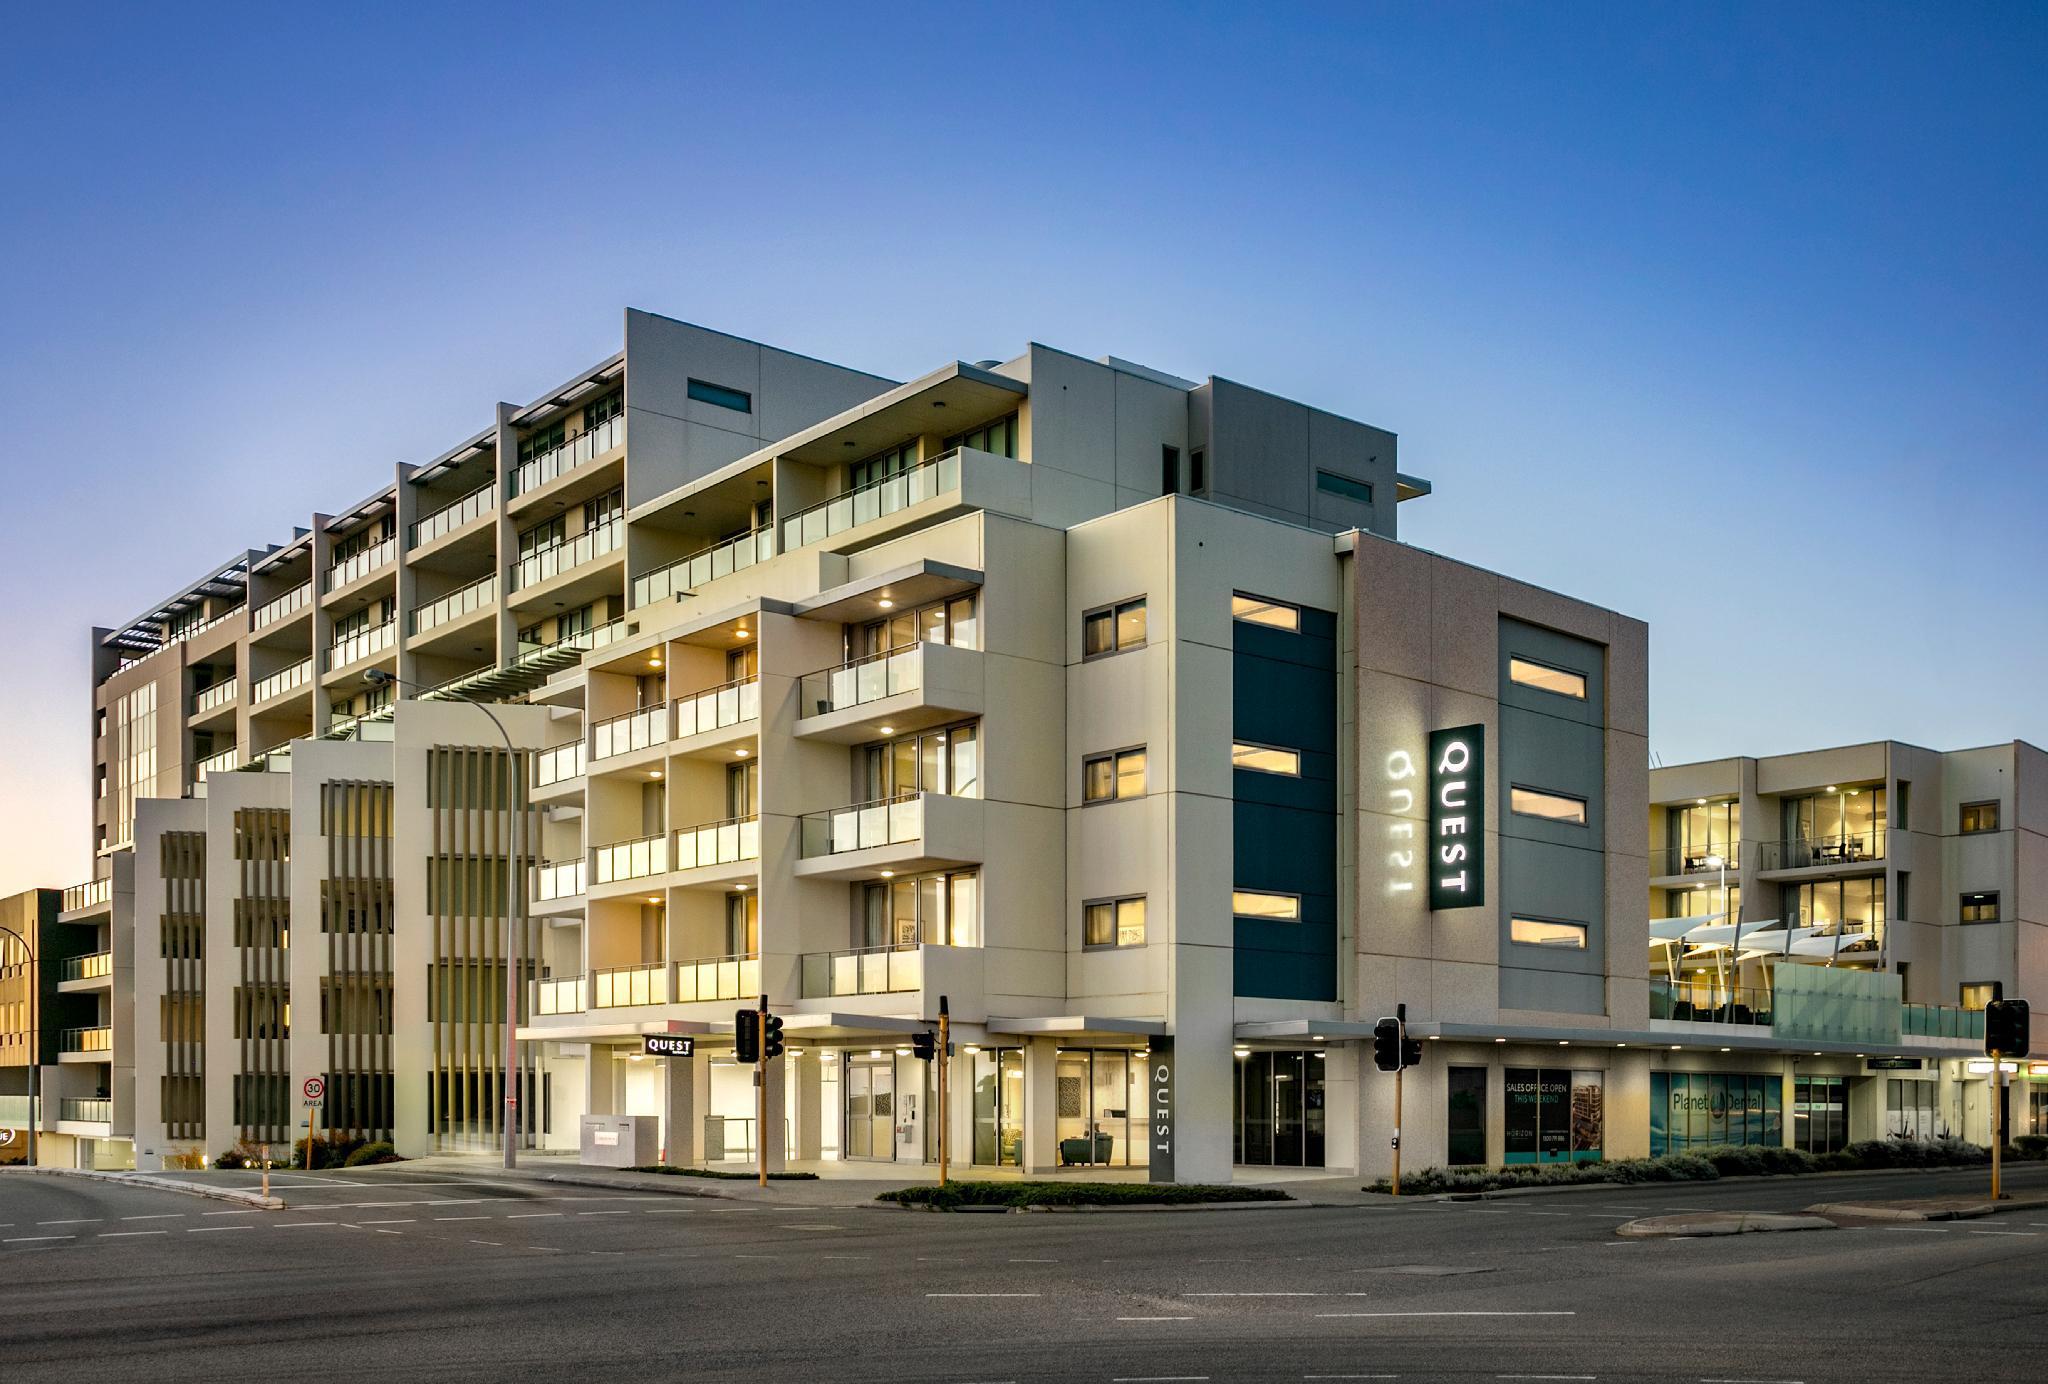 Quest Scarborough Apartments